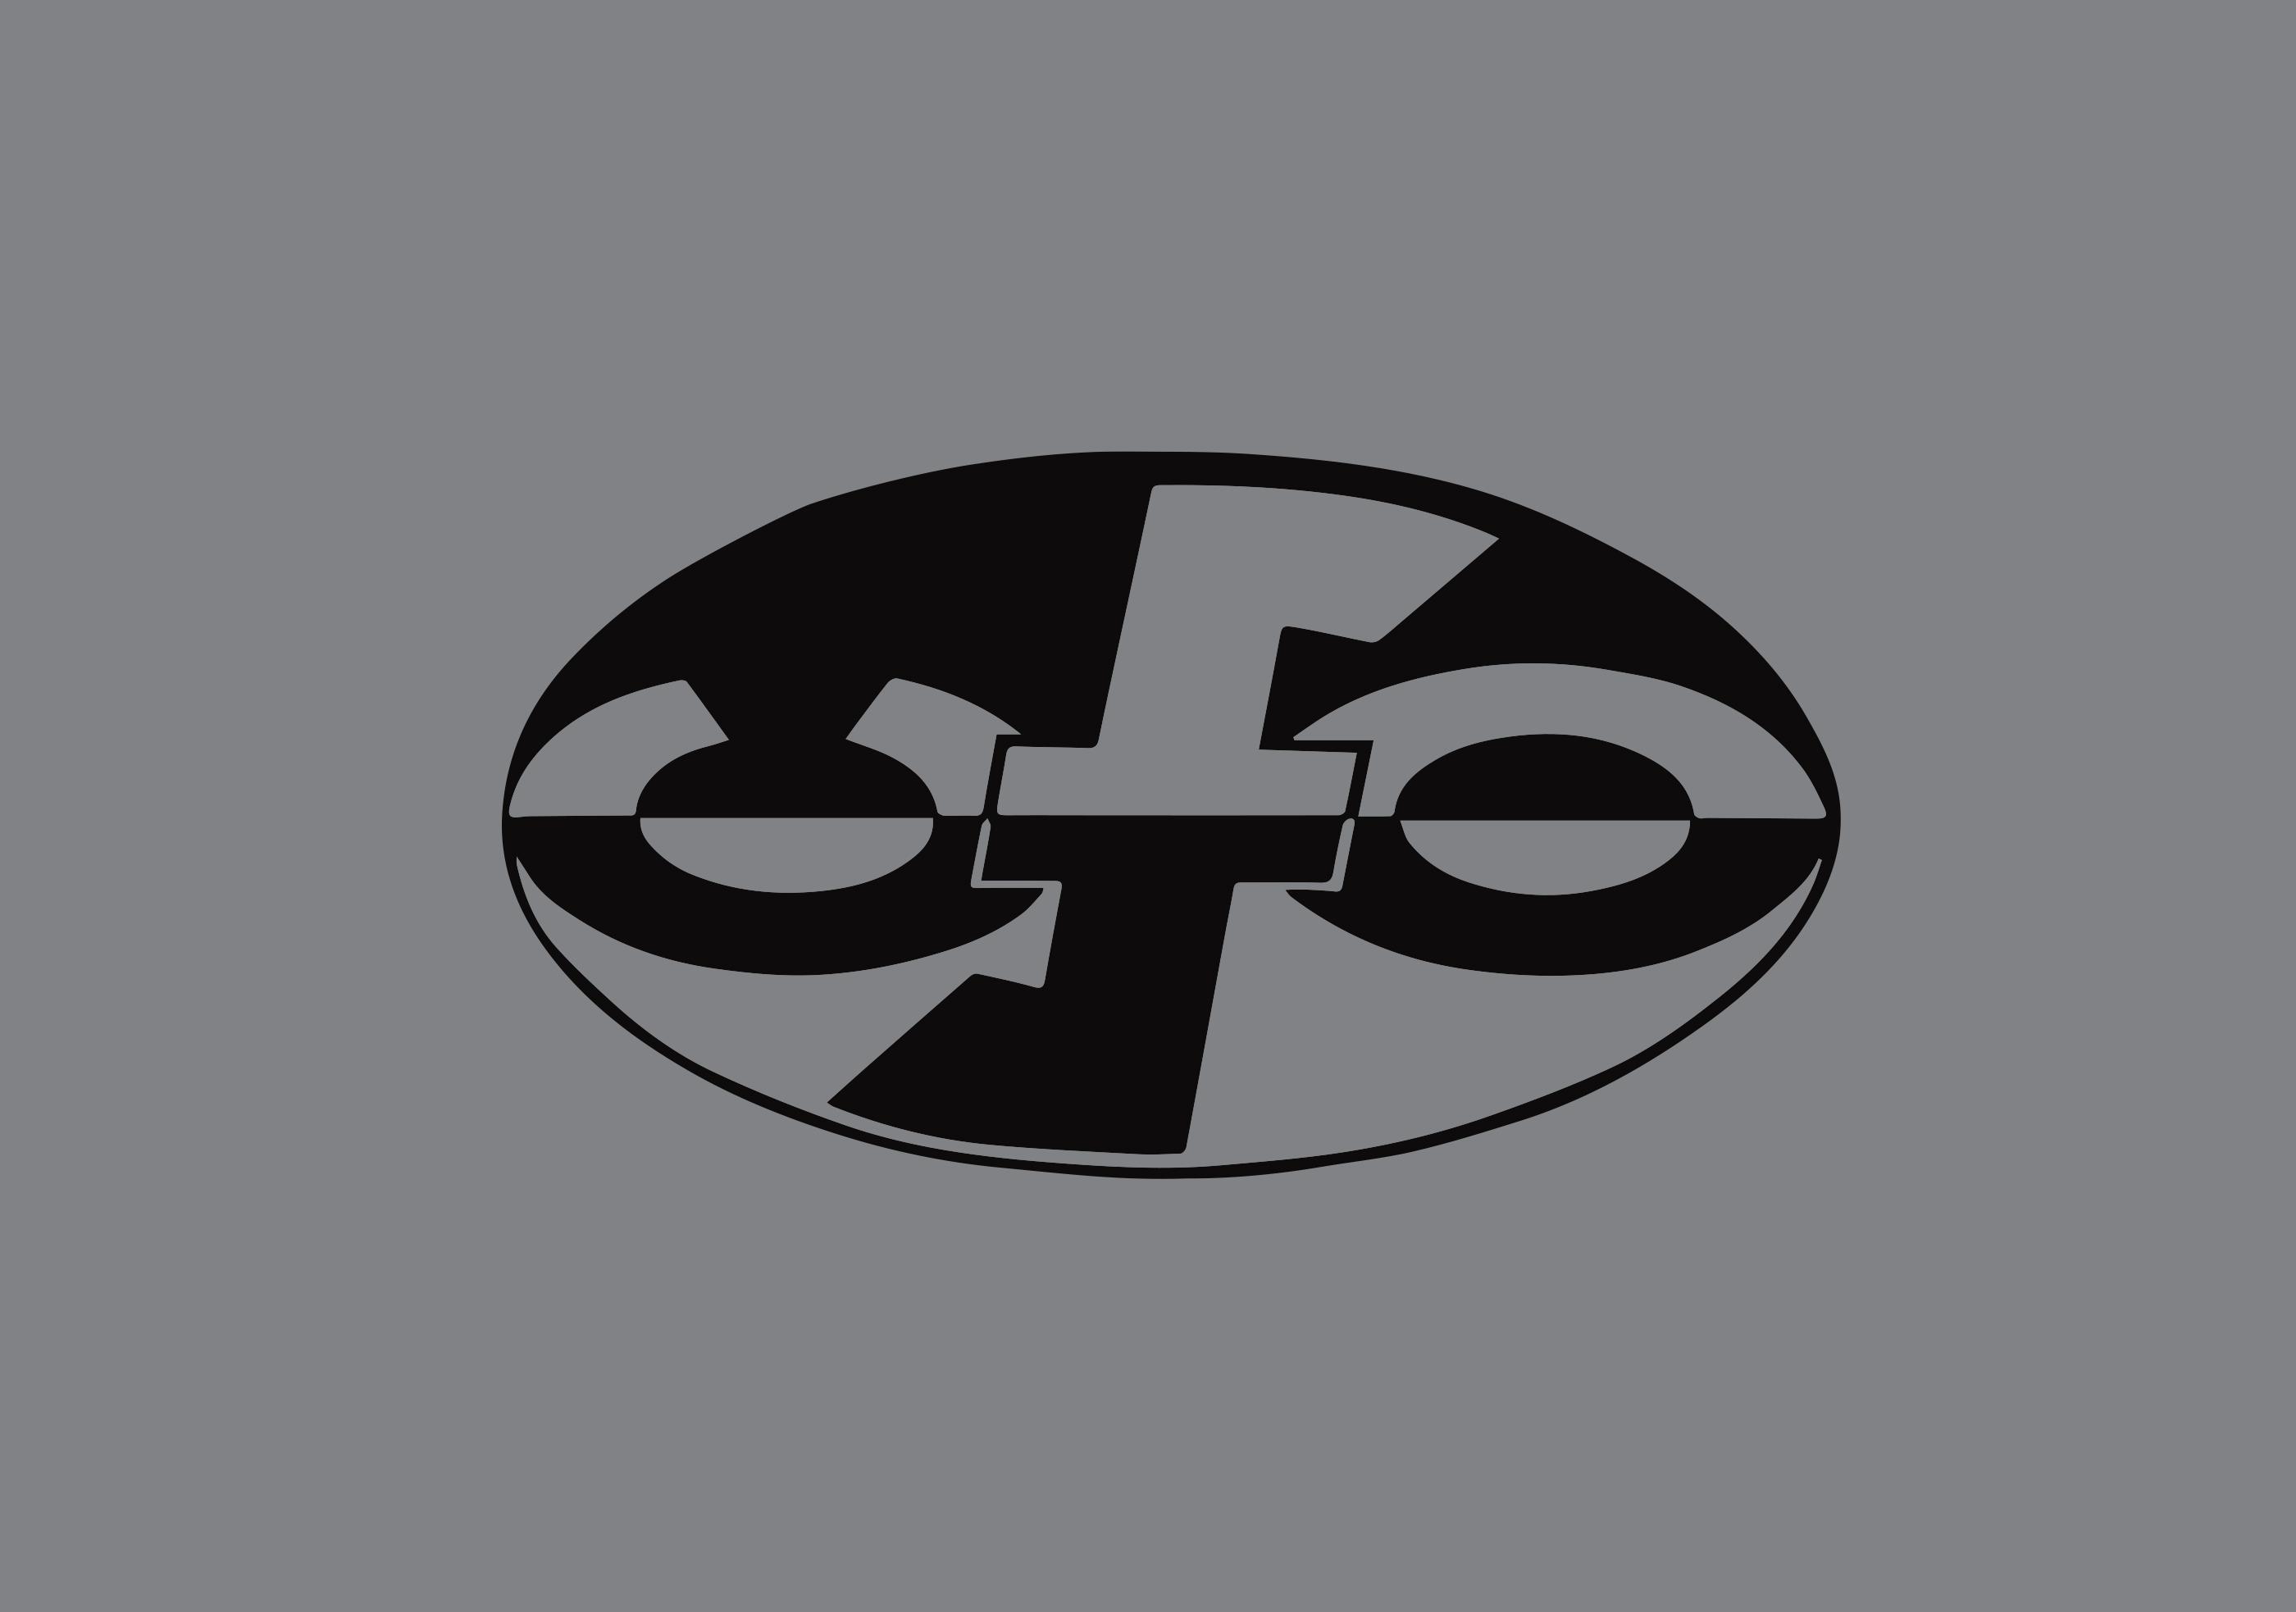 eden_ufo_logo